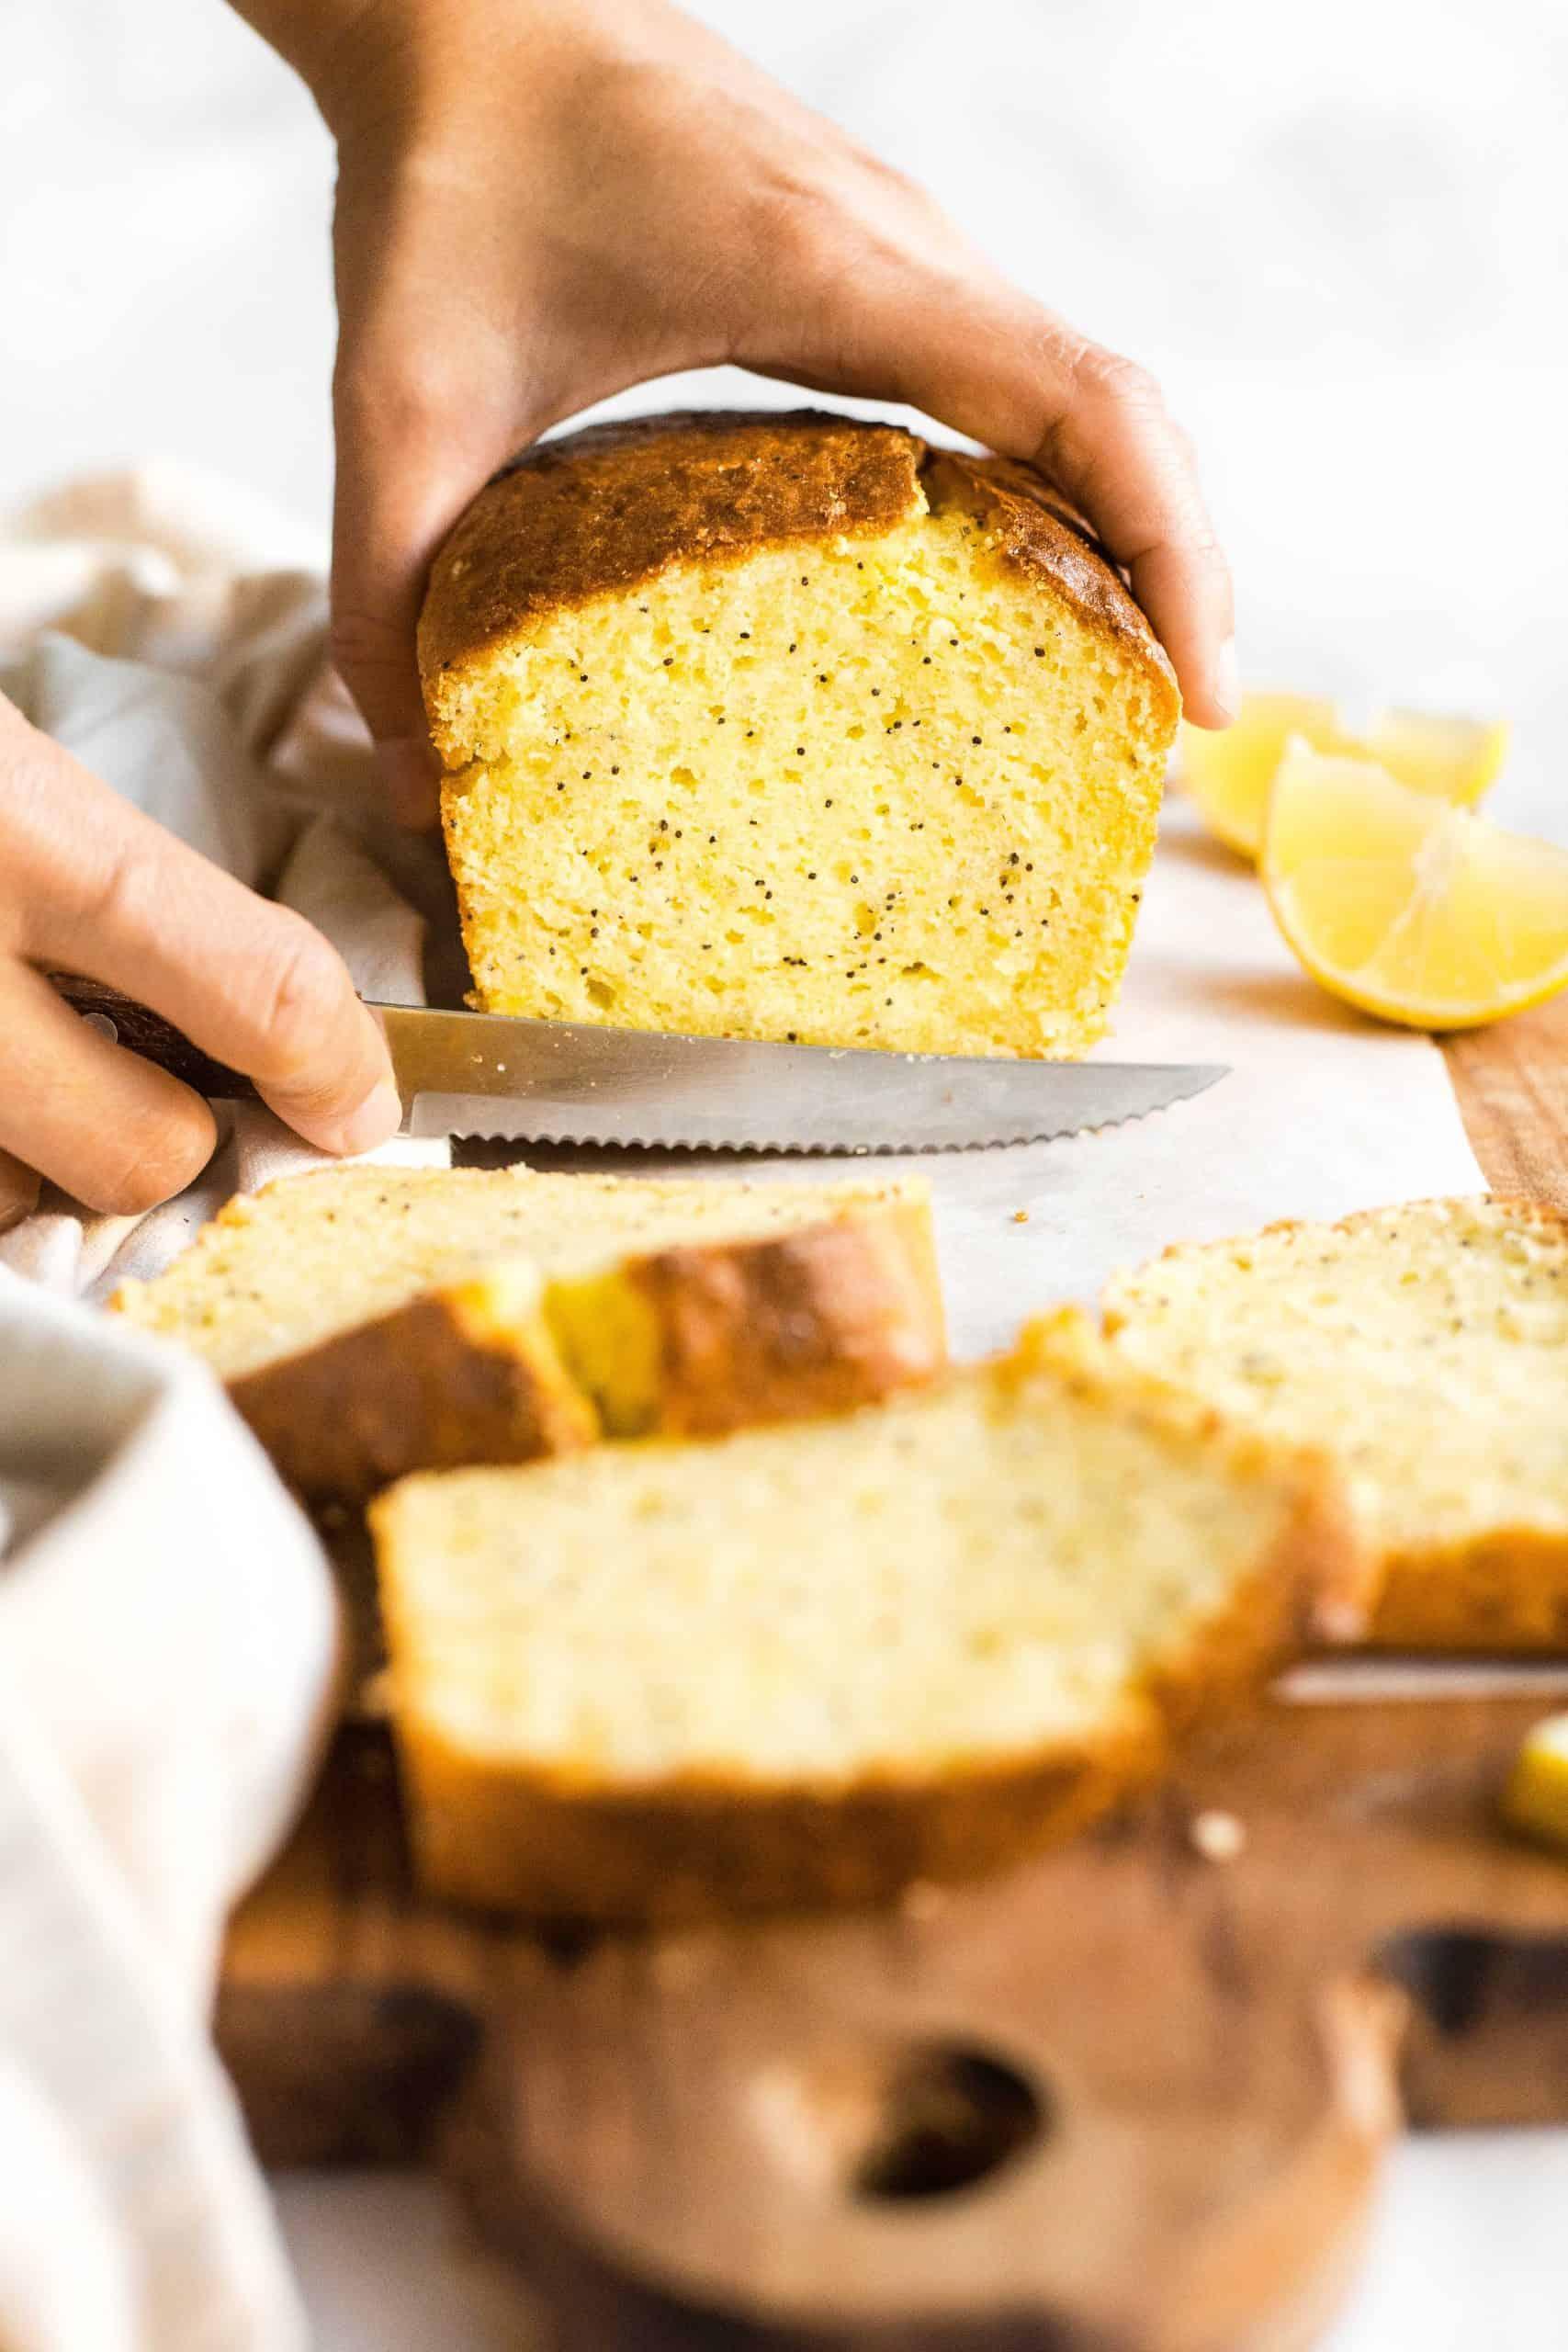 Slicing into a loaf of gluten-free lemon poppyseed bread.